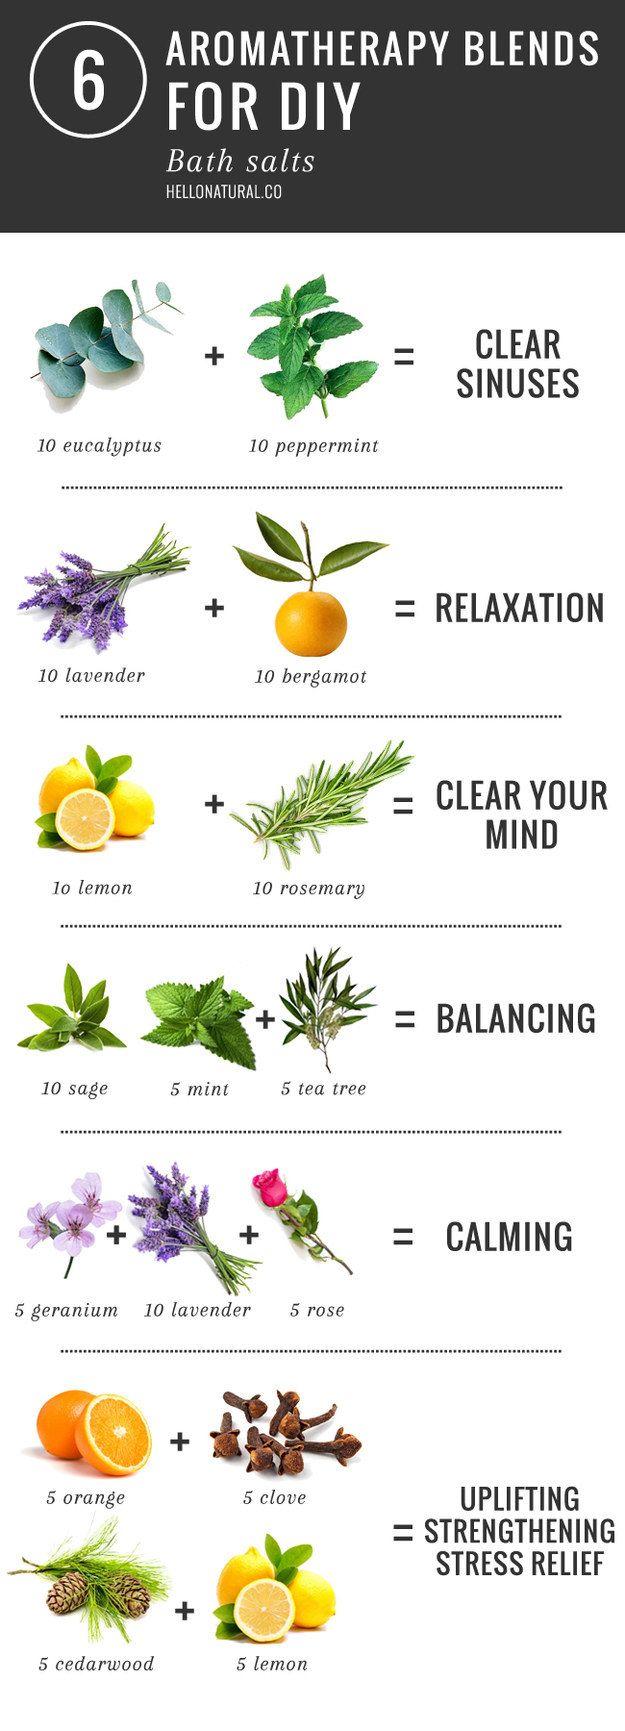 Add essential oils to some bath salts and make these calming combinations! #essentialoils #bathsalts #diybathsalts #stressfree #stressrelief #destressforless #relaxation